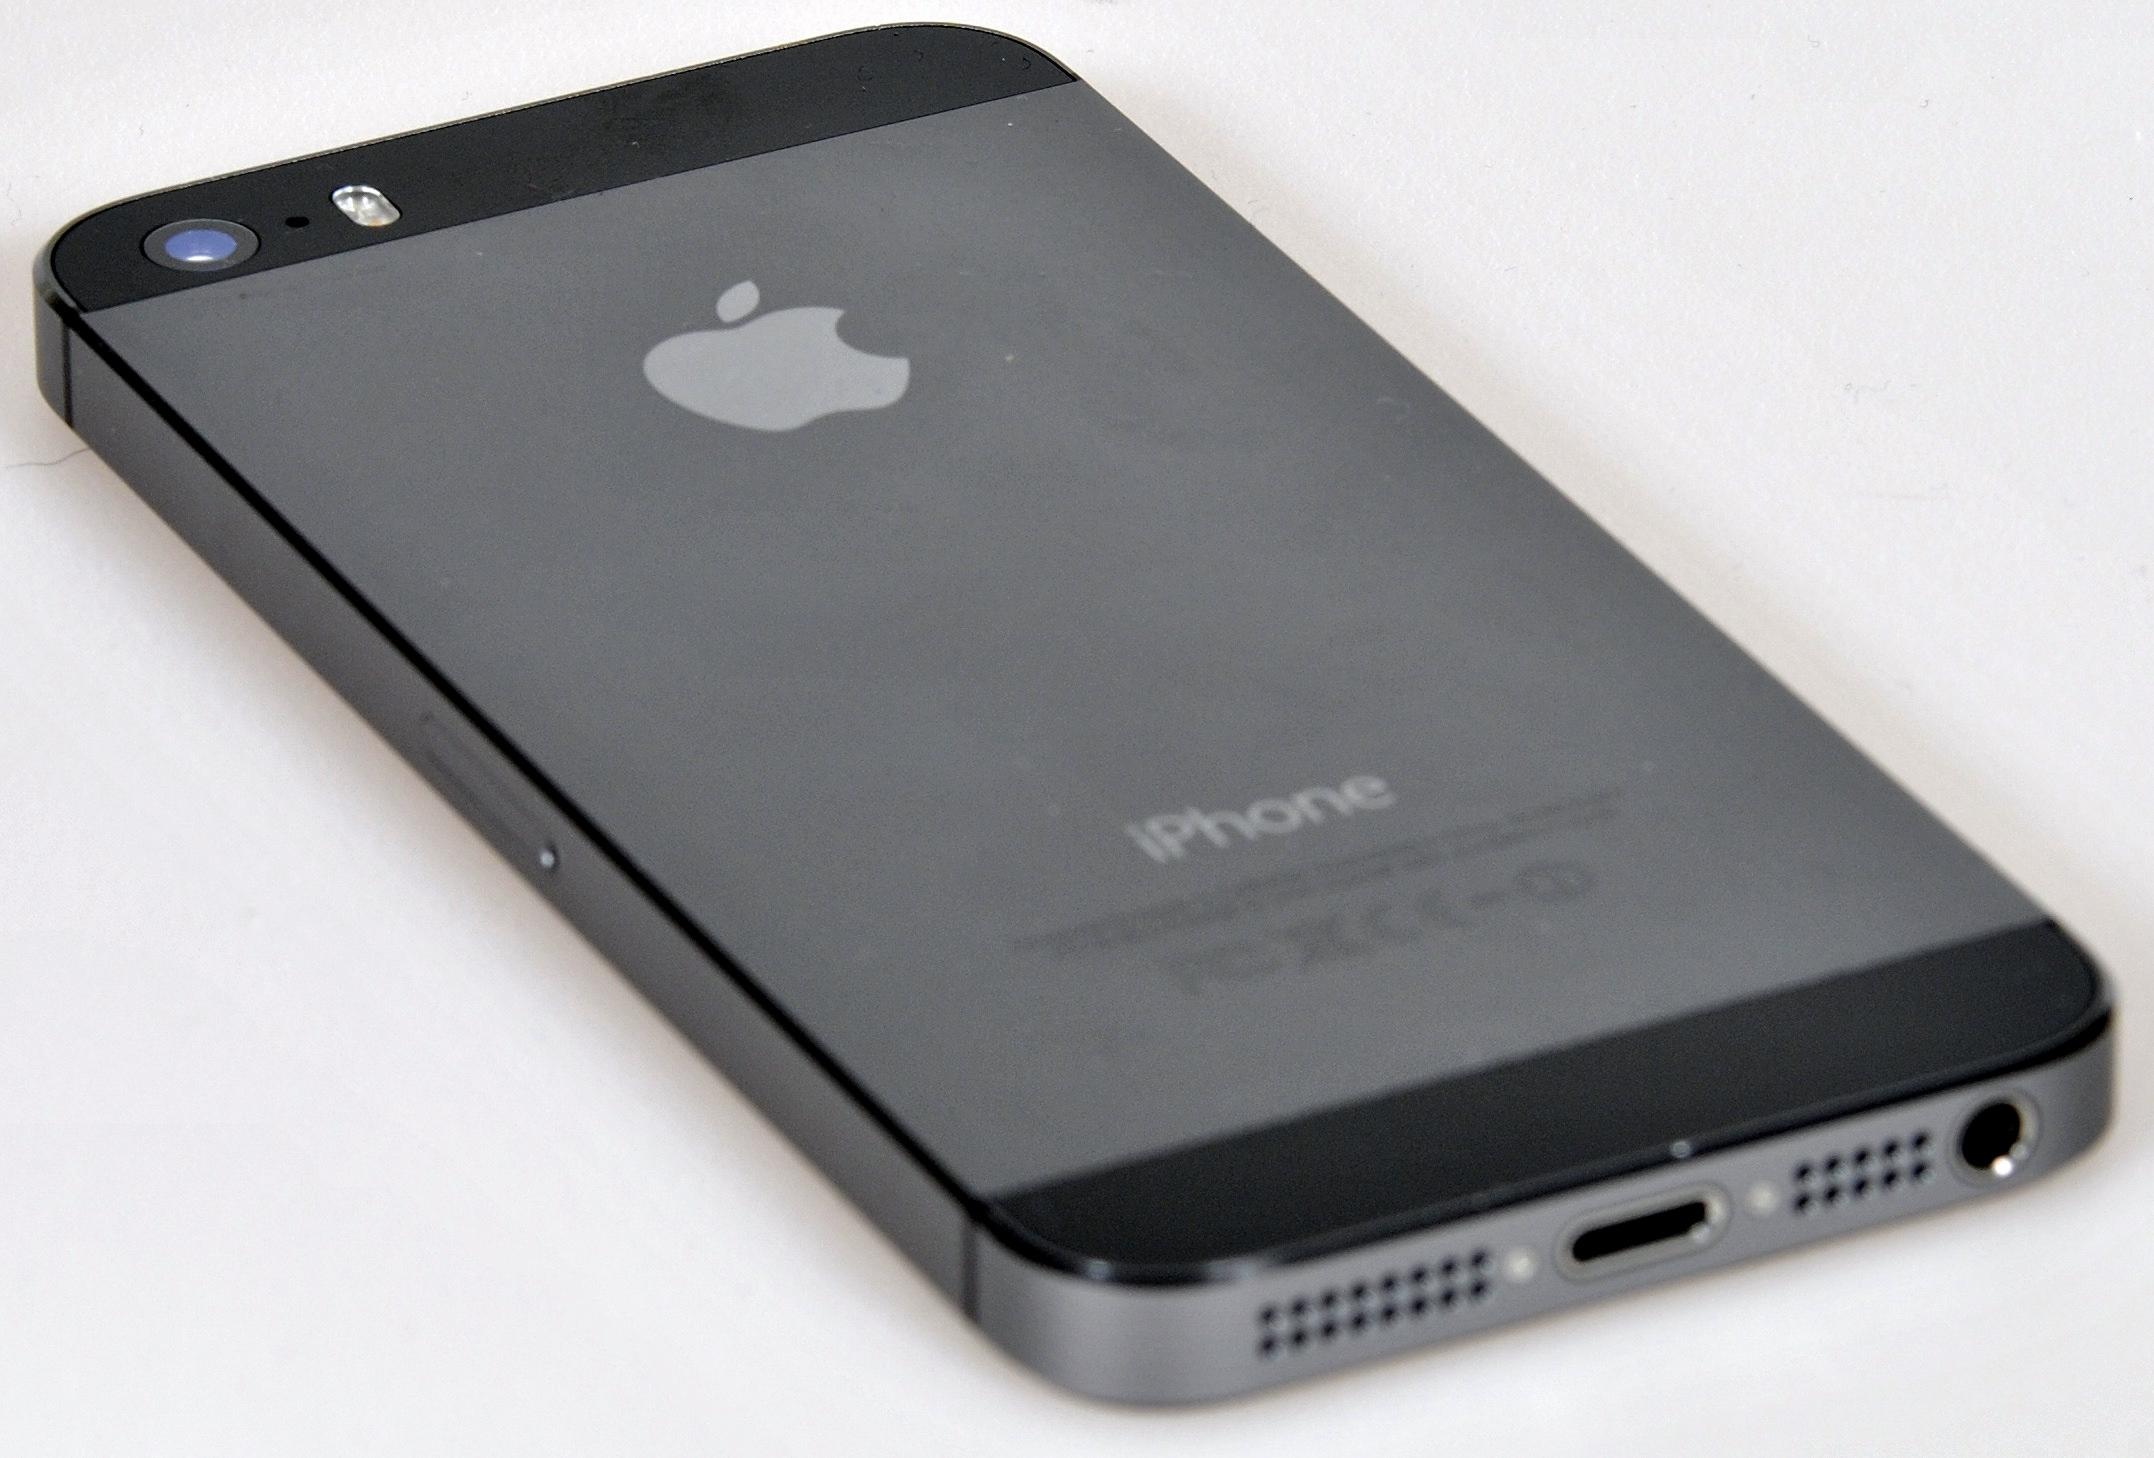 Ap apple iphone 5s space gray 32gb - Apple Iphone 5s 2